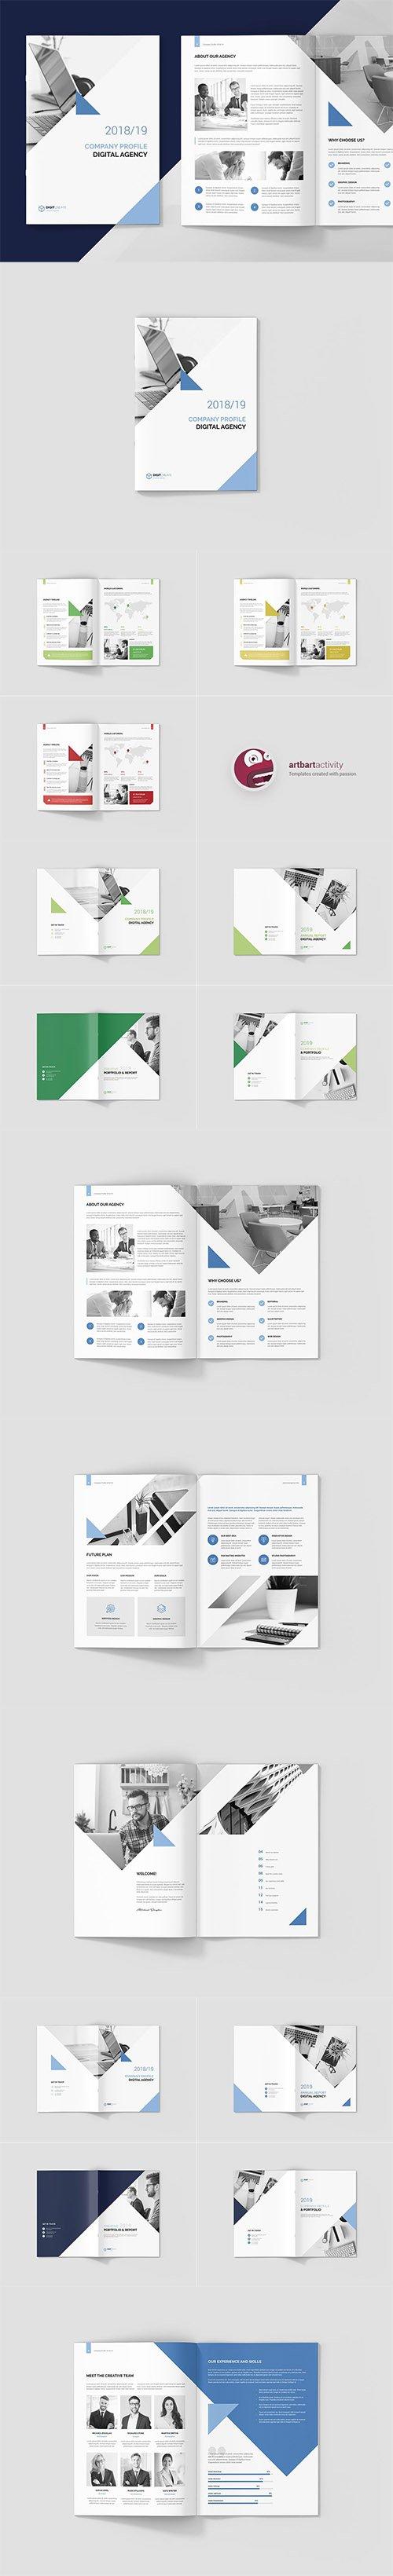 Digital Agency – Company Profile